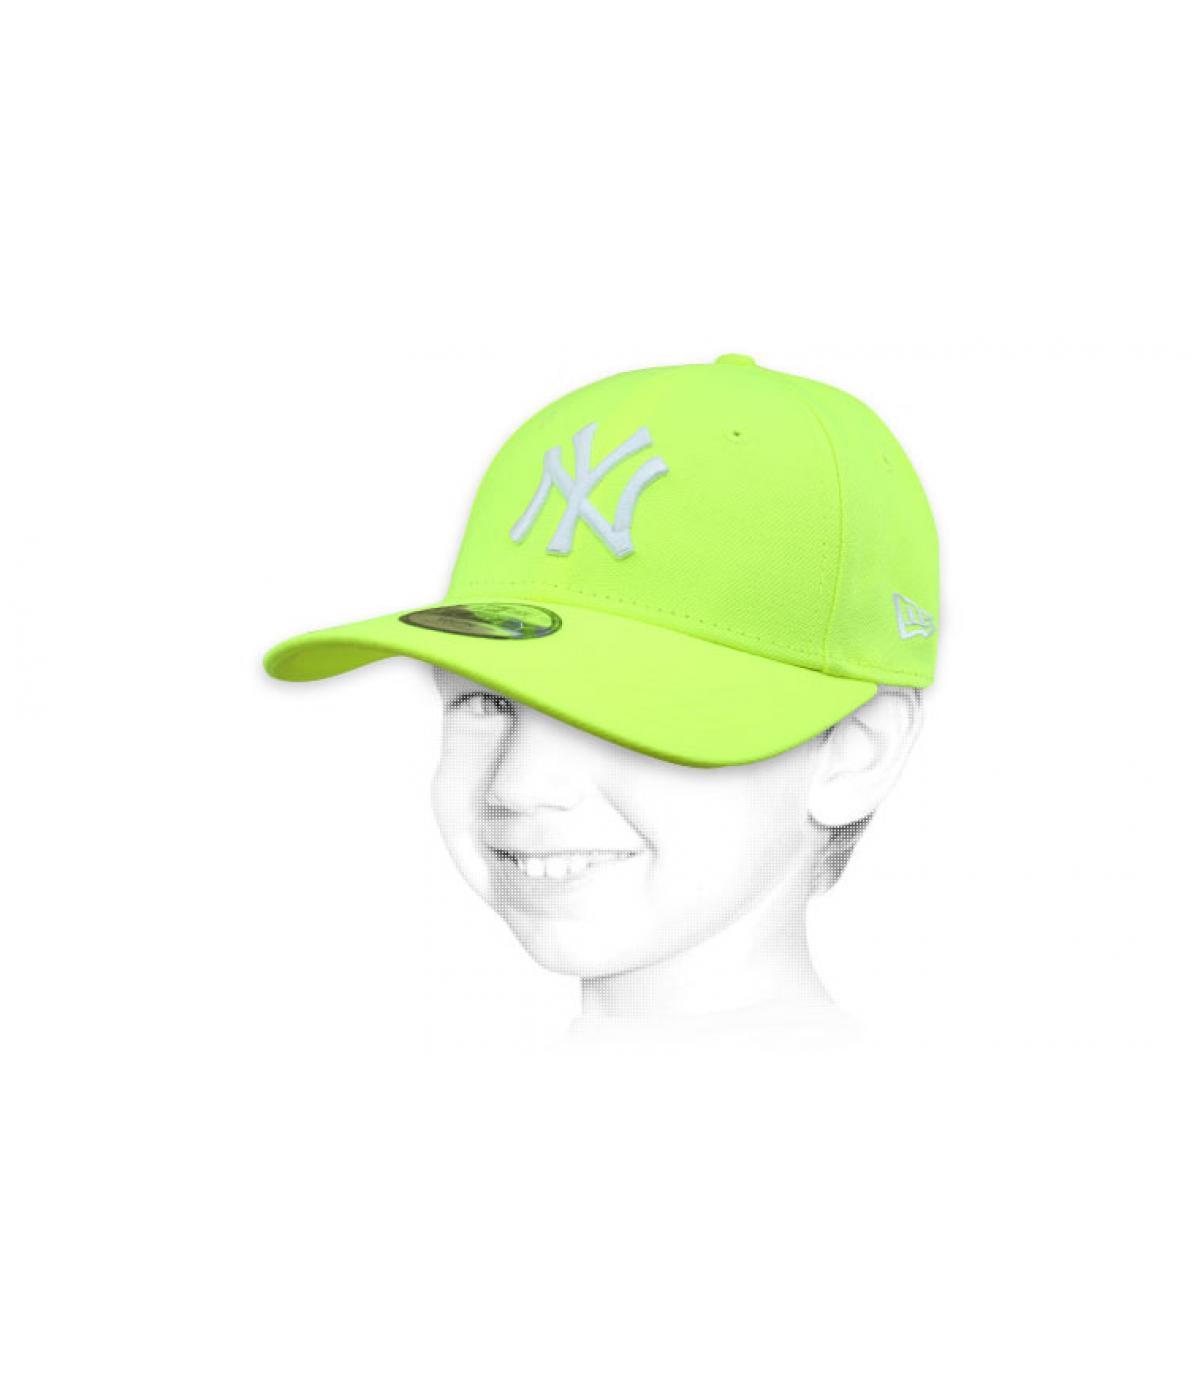 casquette enfant NY jaune